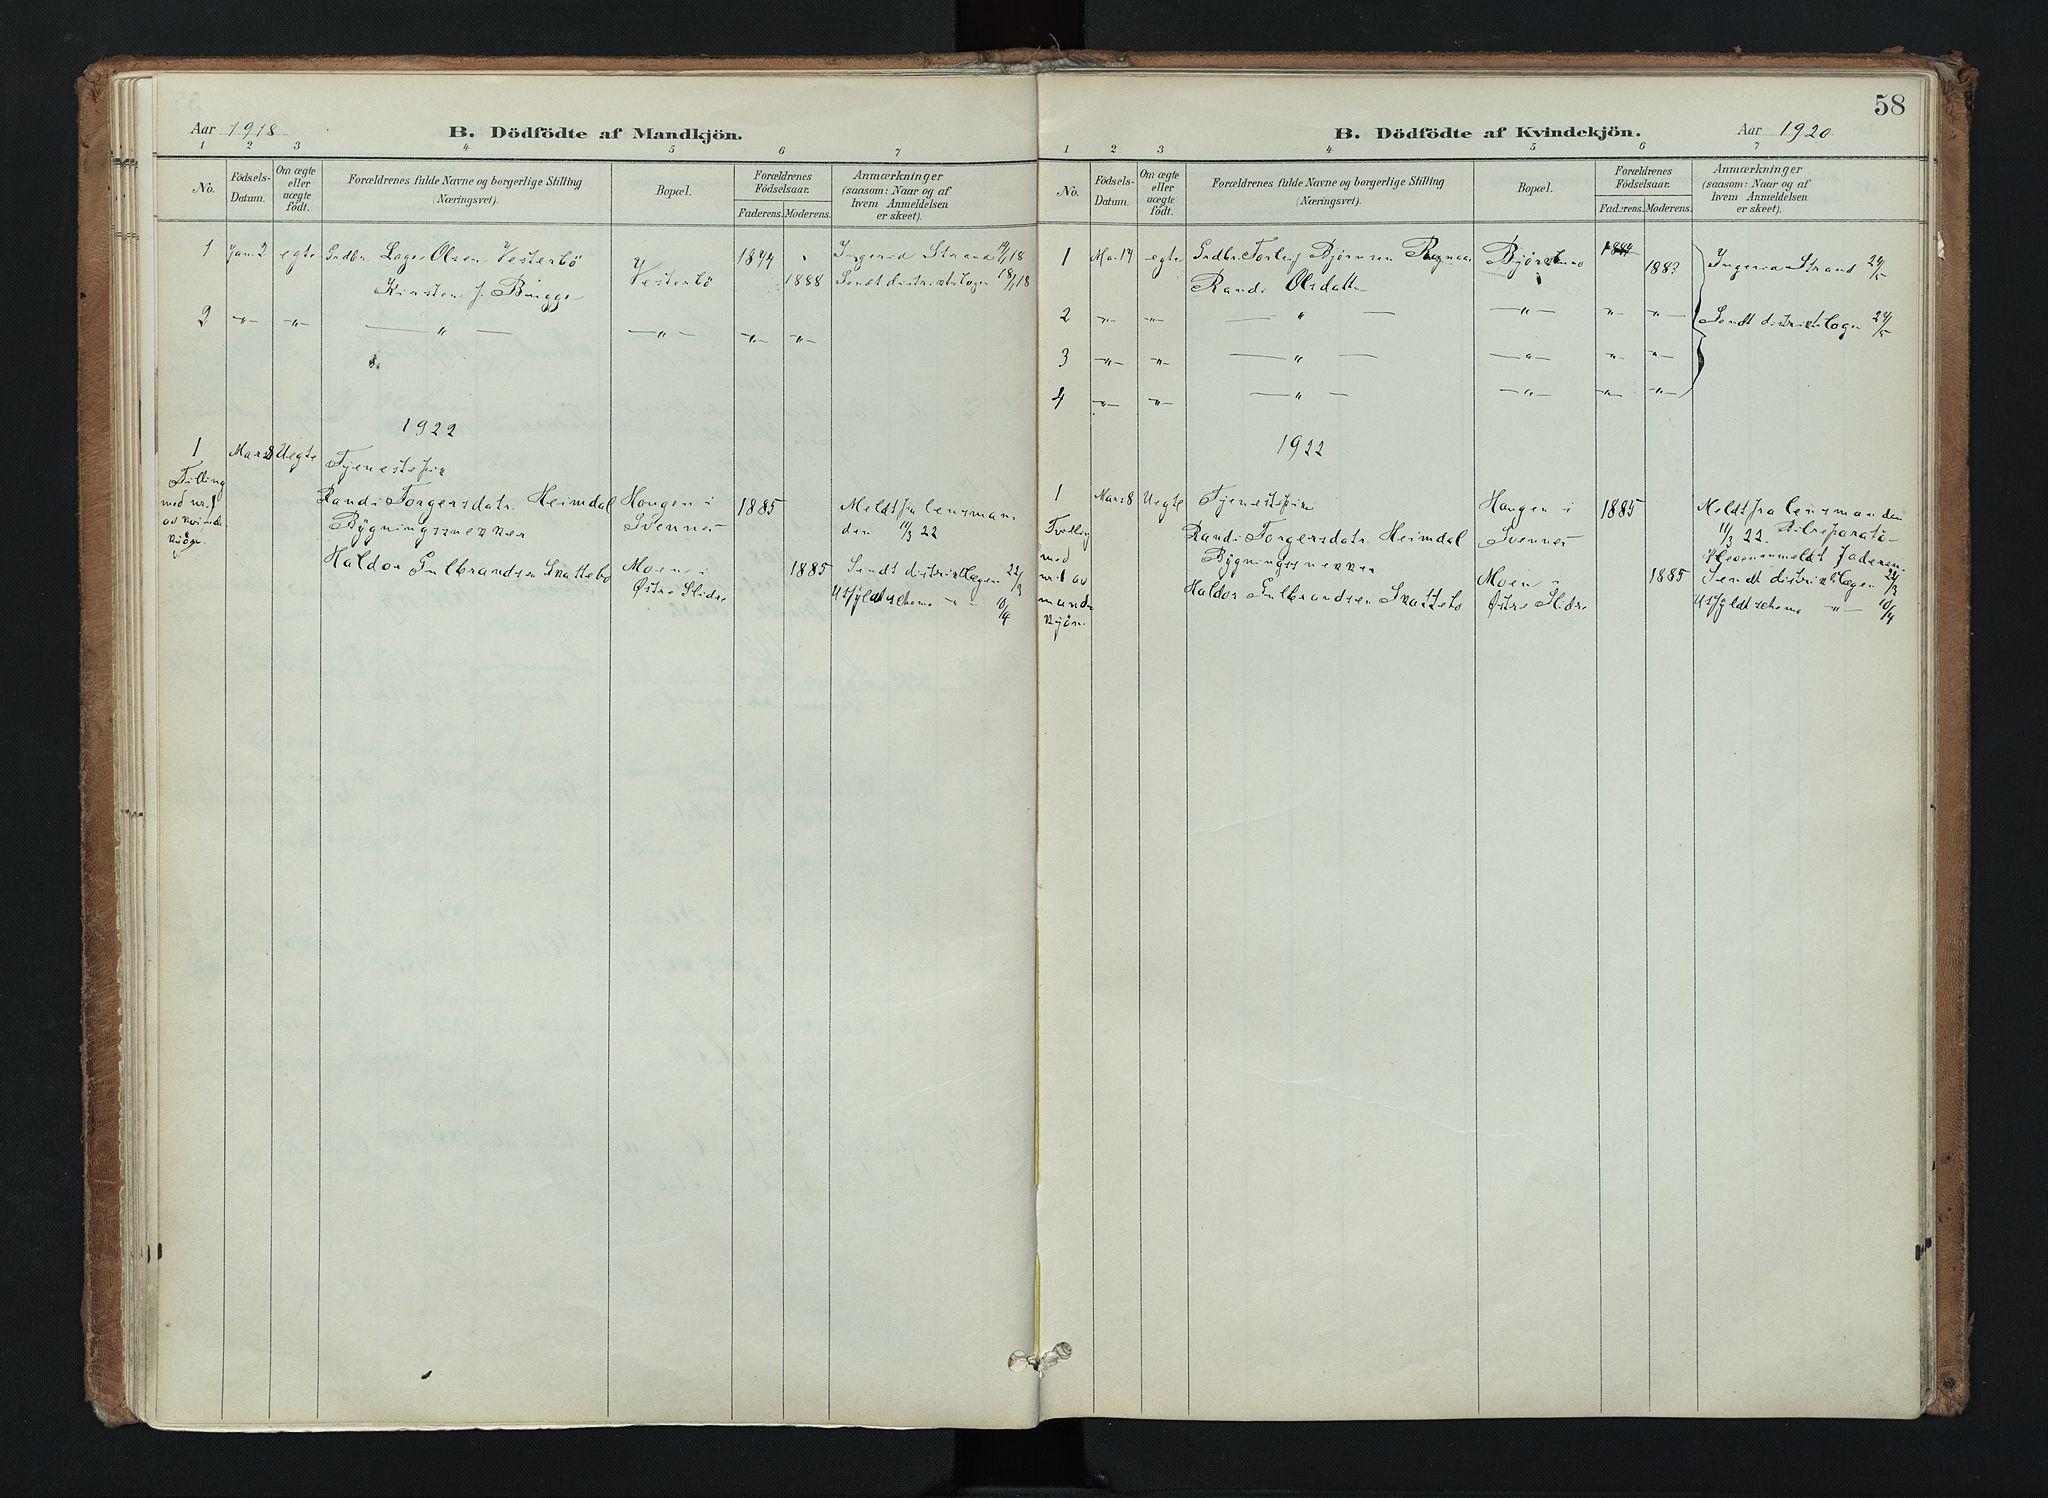 SAH, Nord-Aurdal prestekontor, Ministerialbok nr. 16, 1897-1925, s. 58